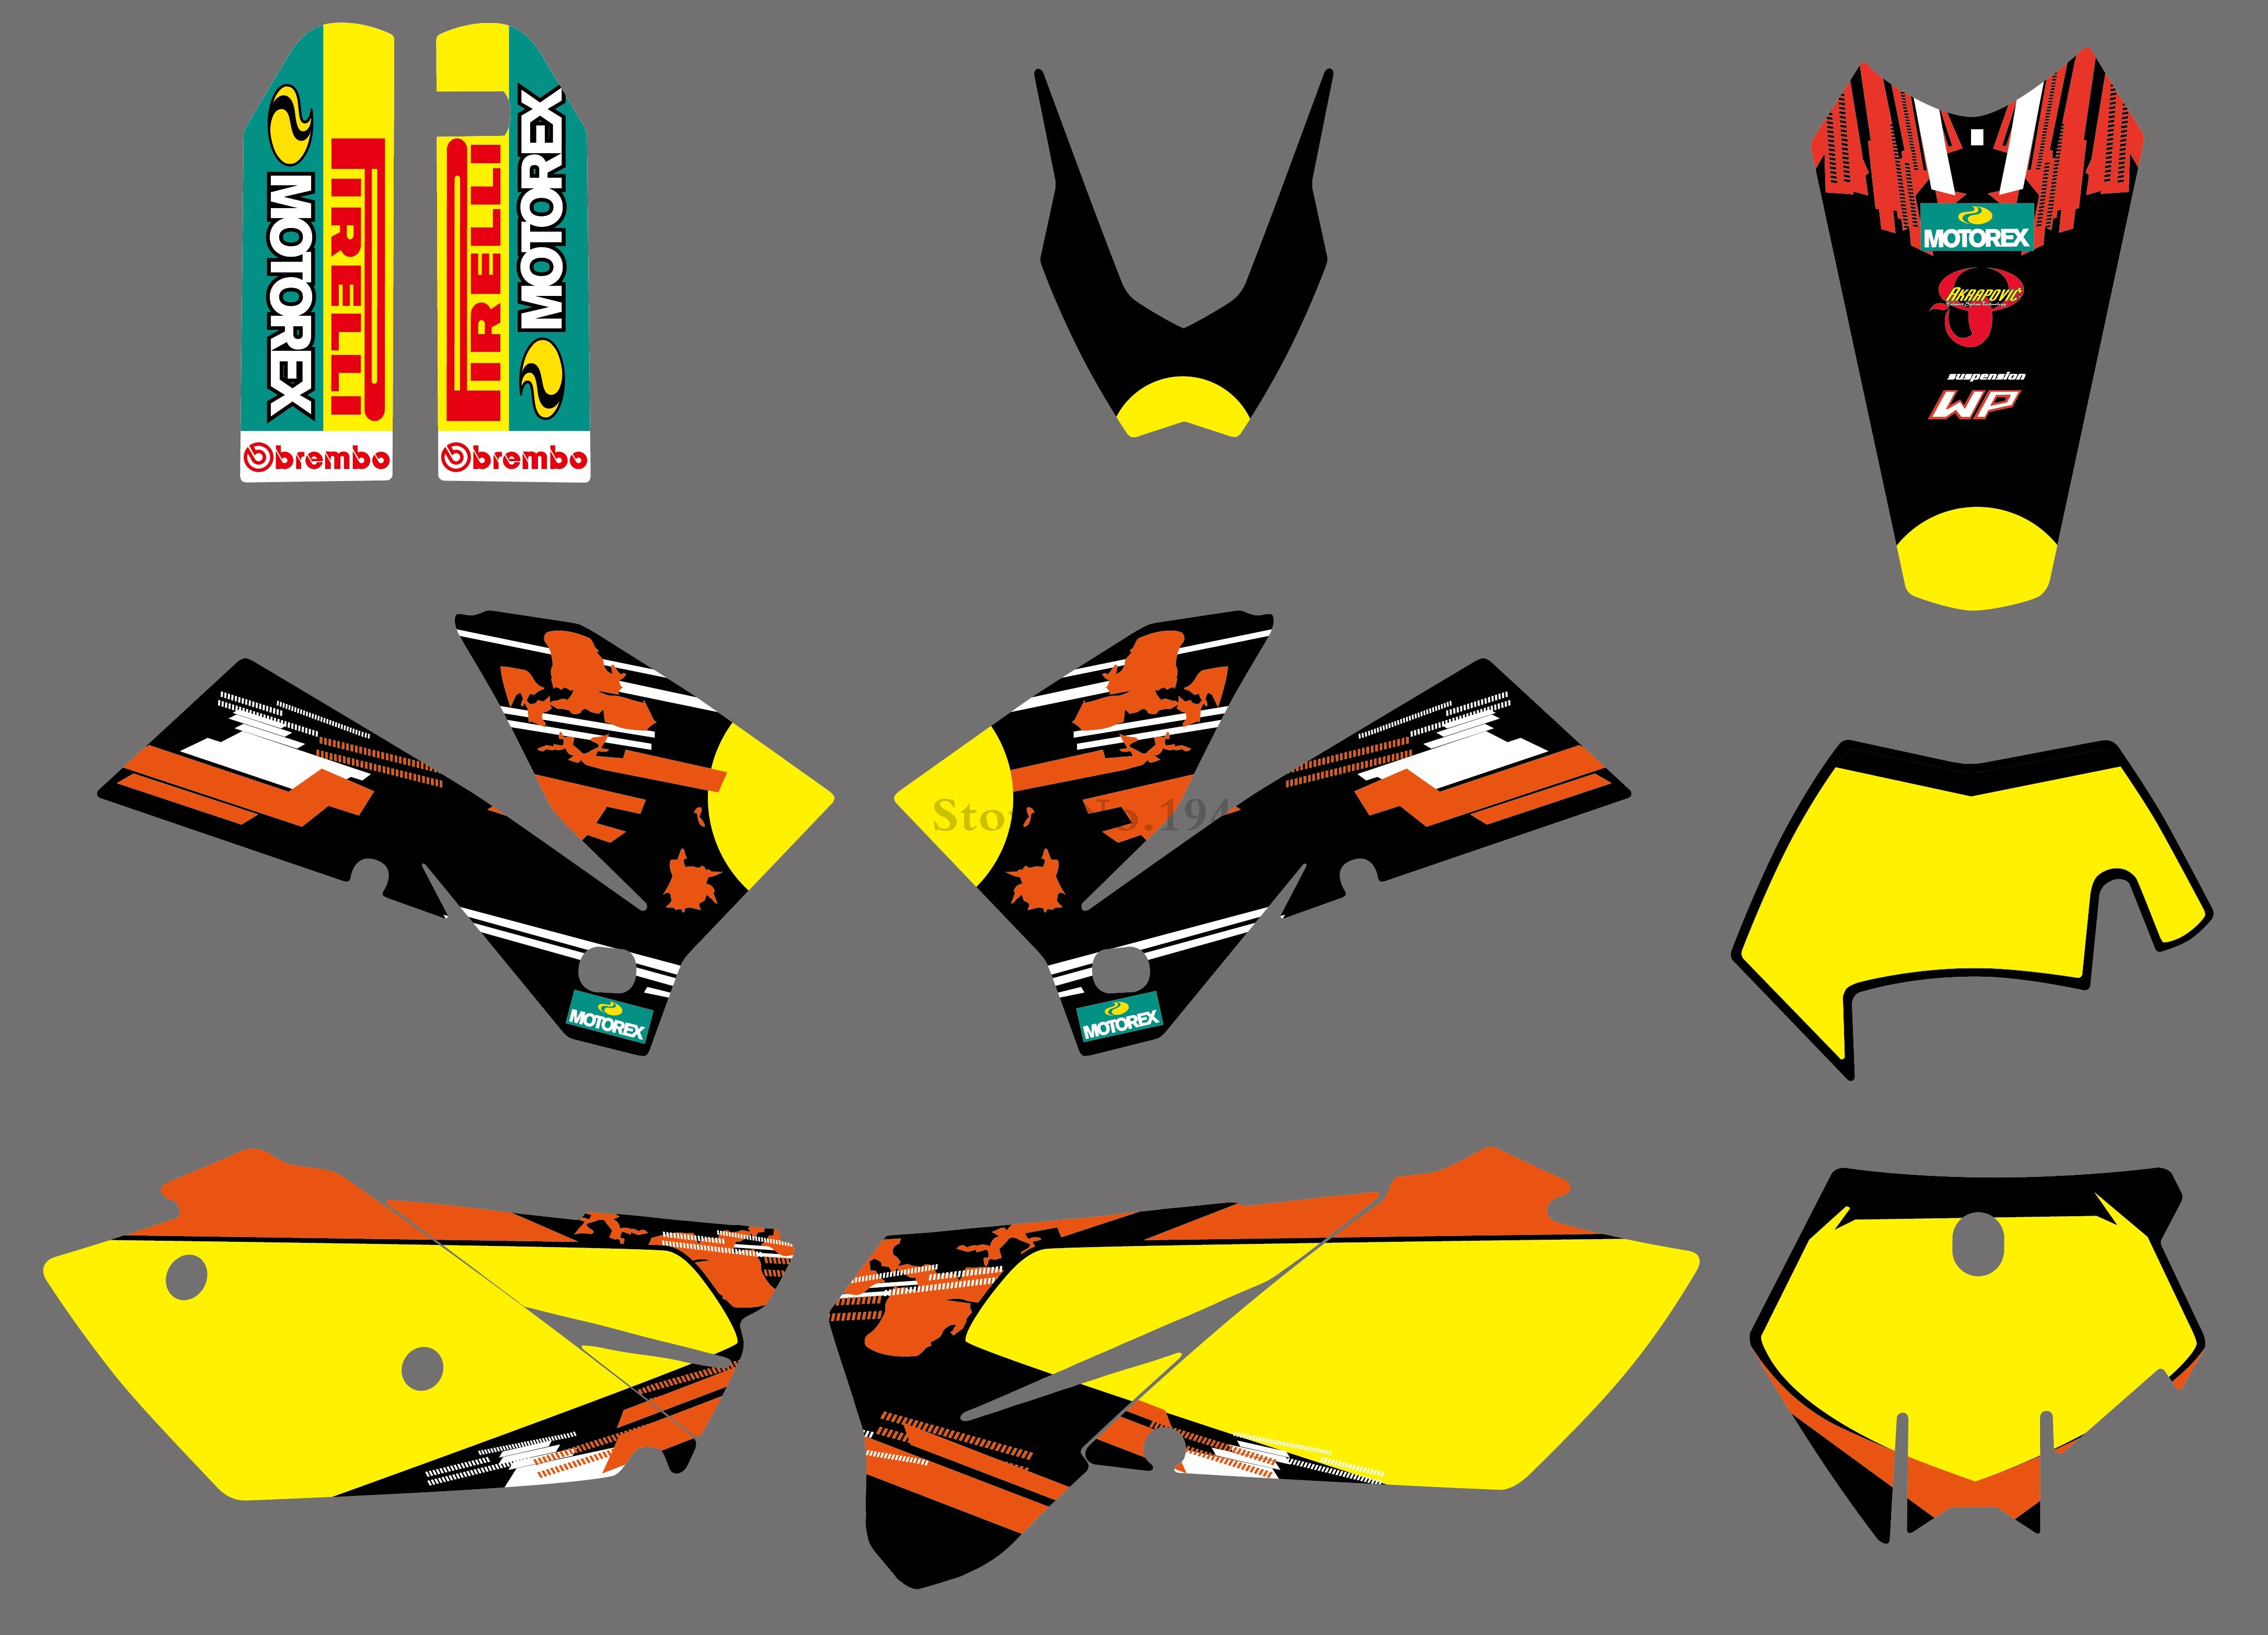 H2cnc 2 вида стилей команды Графика Наклейки наклейки комплект для KTM 125 200 250 300 400 450 525 540 SX XC EXC MXC XCF xcw 2005-2007